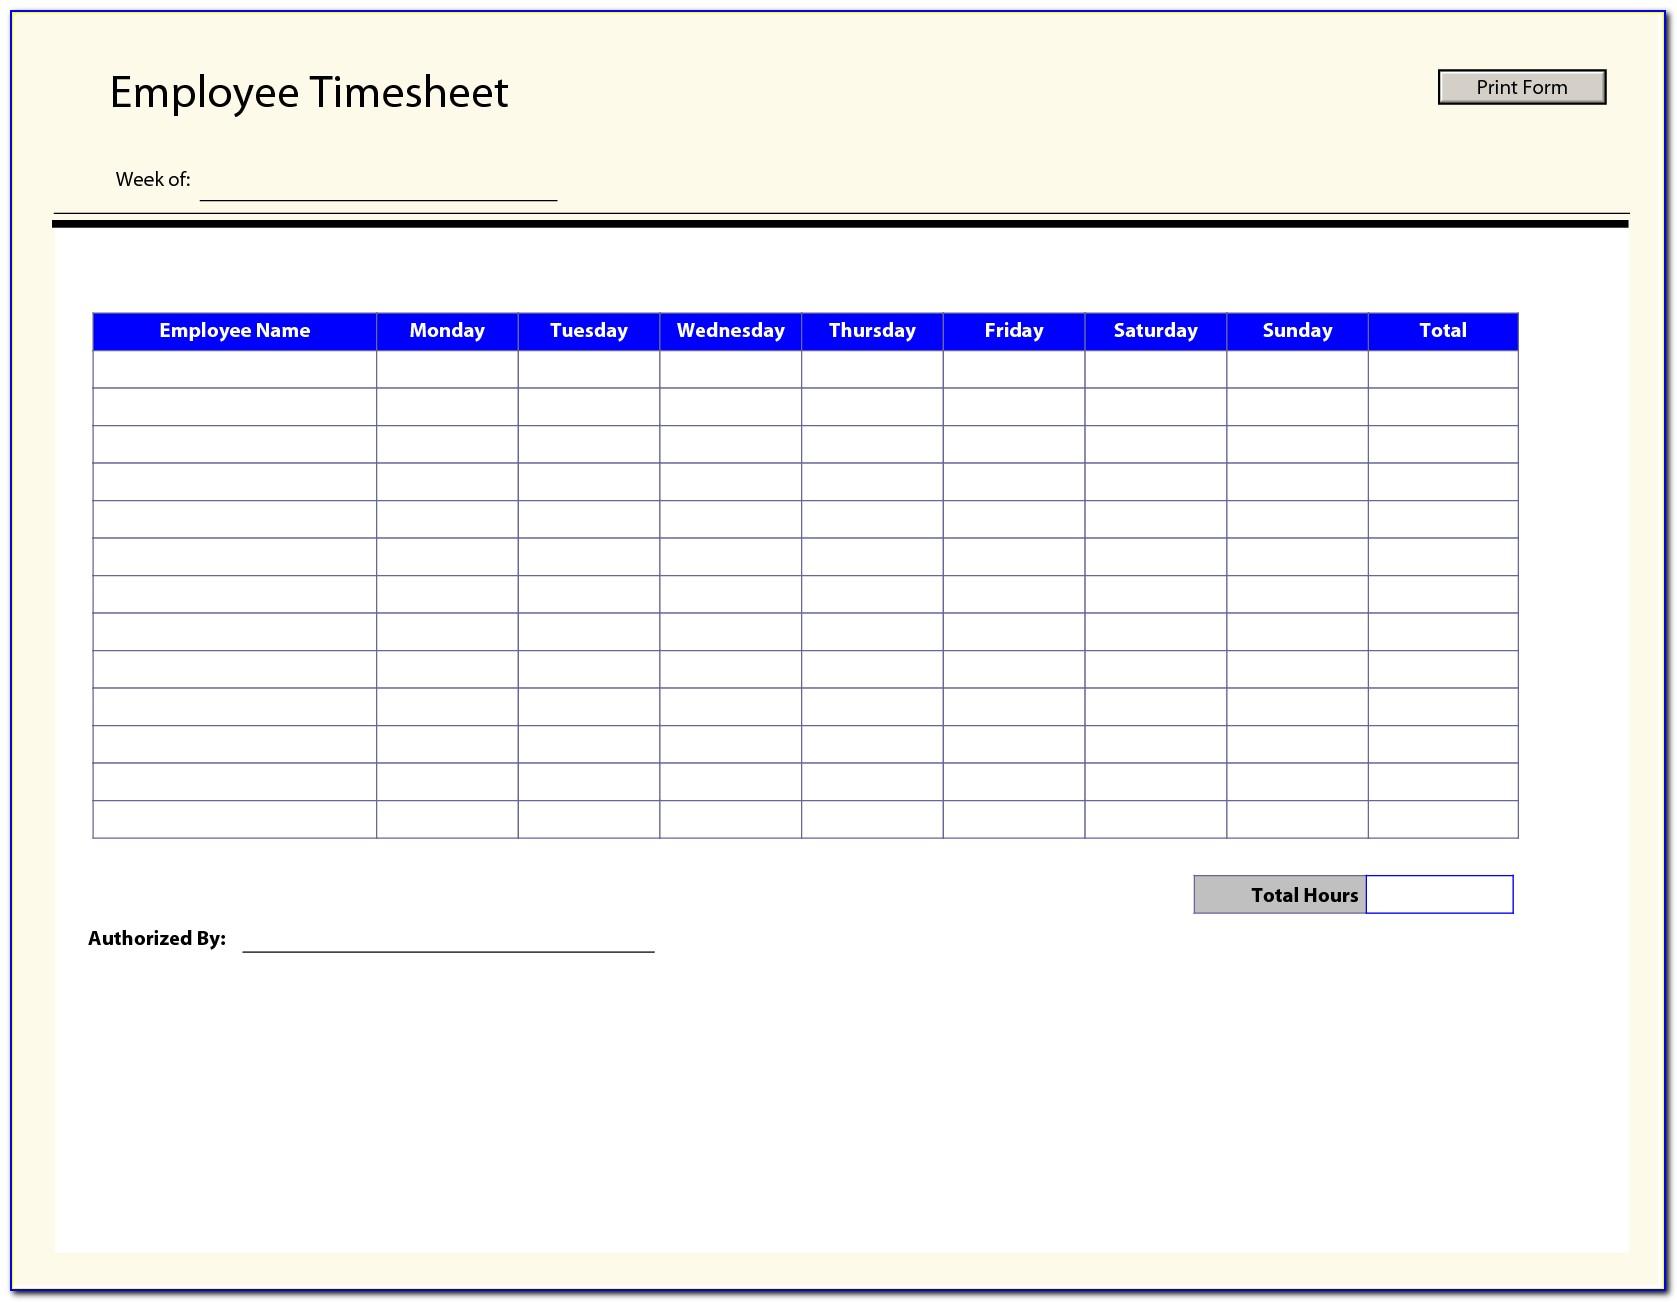 Employee Timesheet Template Free